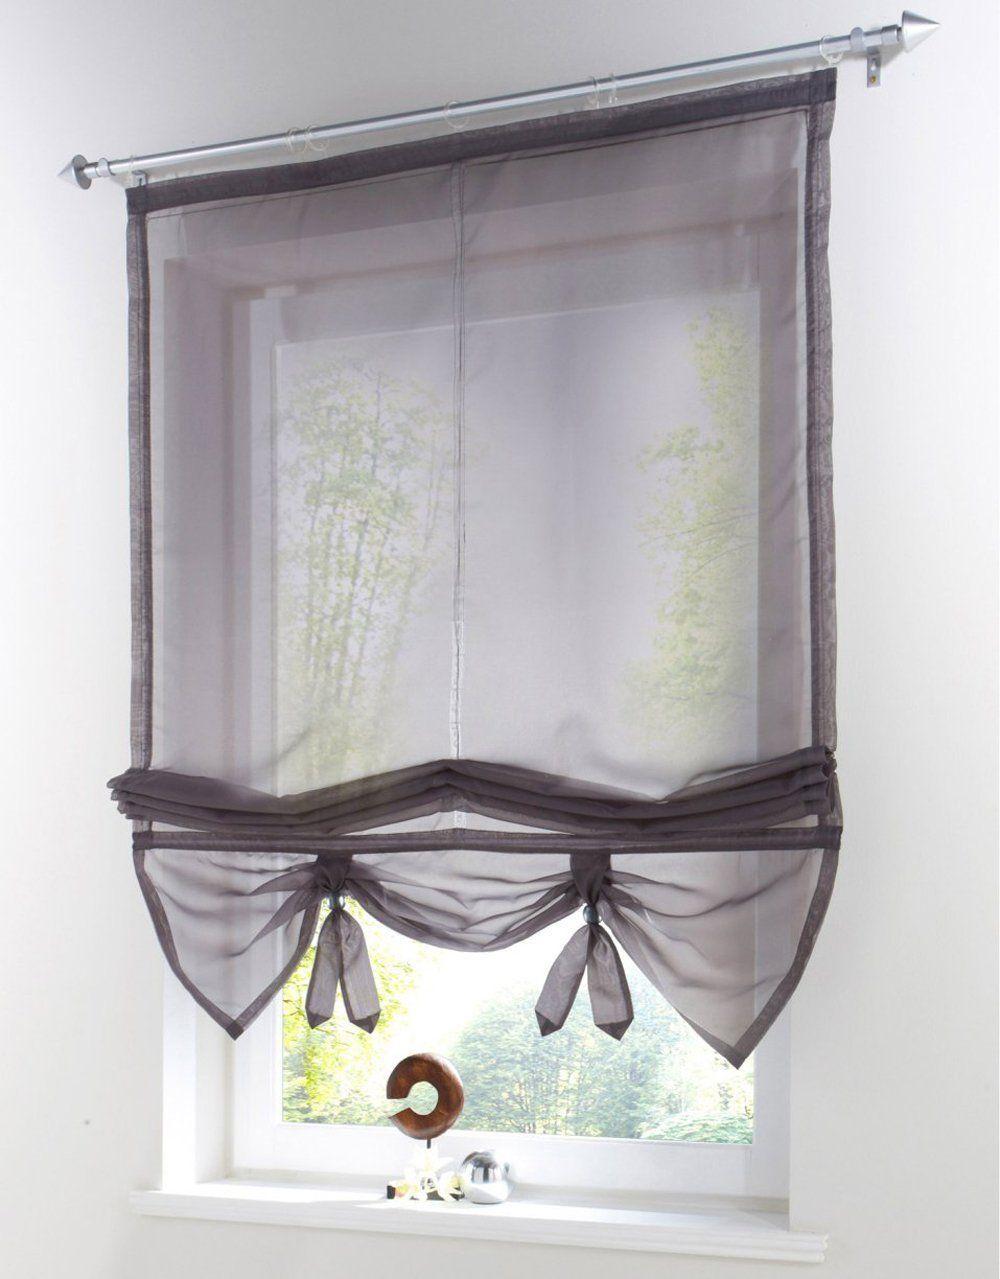 Amazon Uphome 1pcs Liftable Organza Kitchen Balcony Curtains